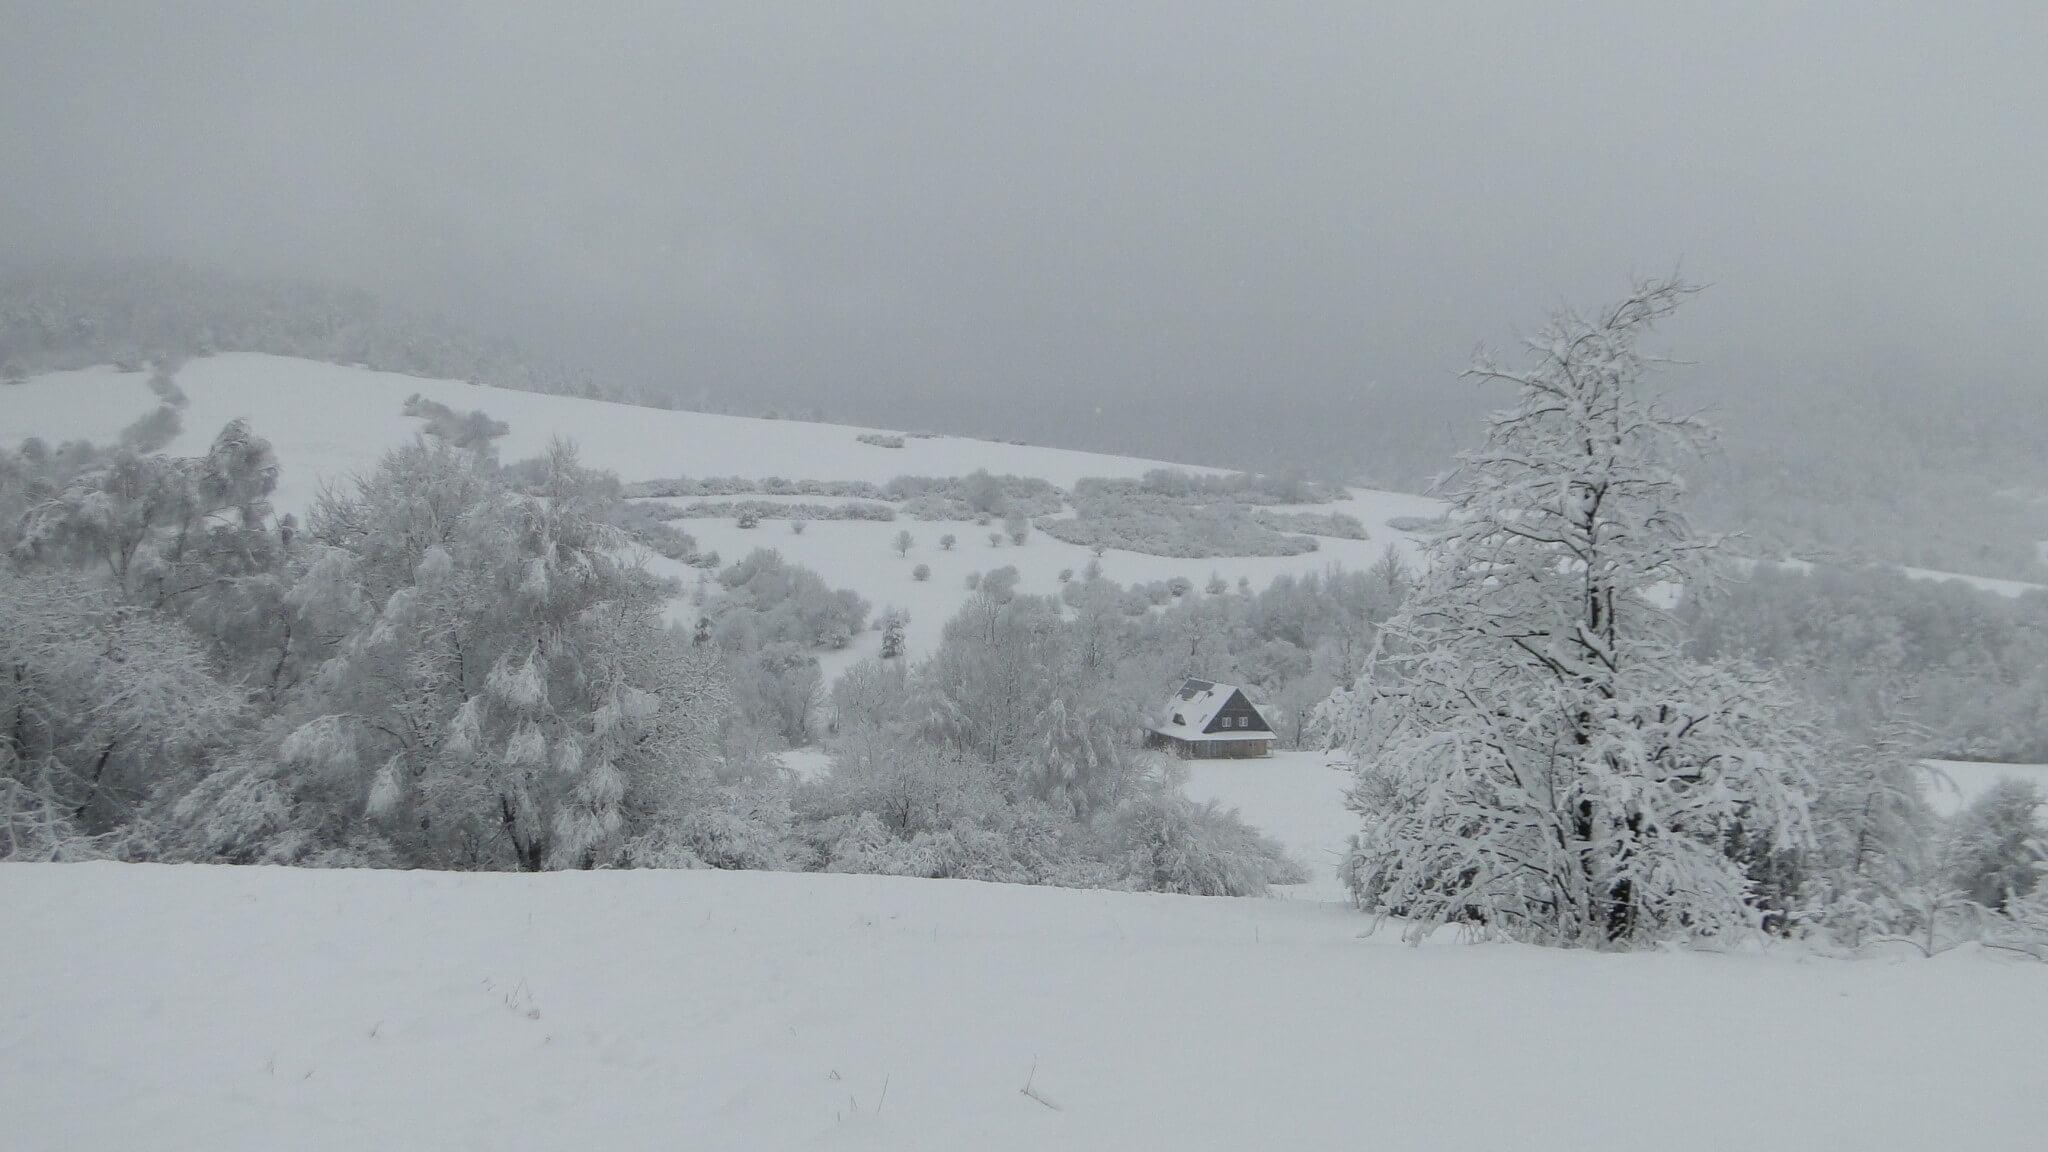 Lutowa zima - śnieżna i mroźna